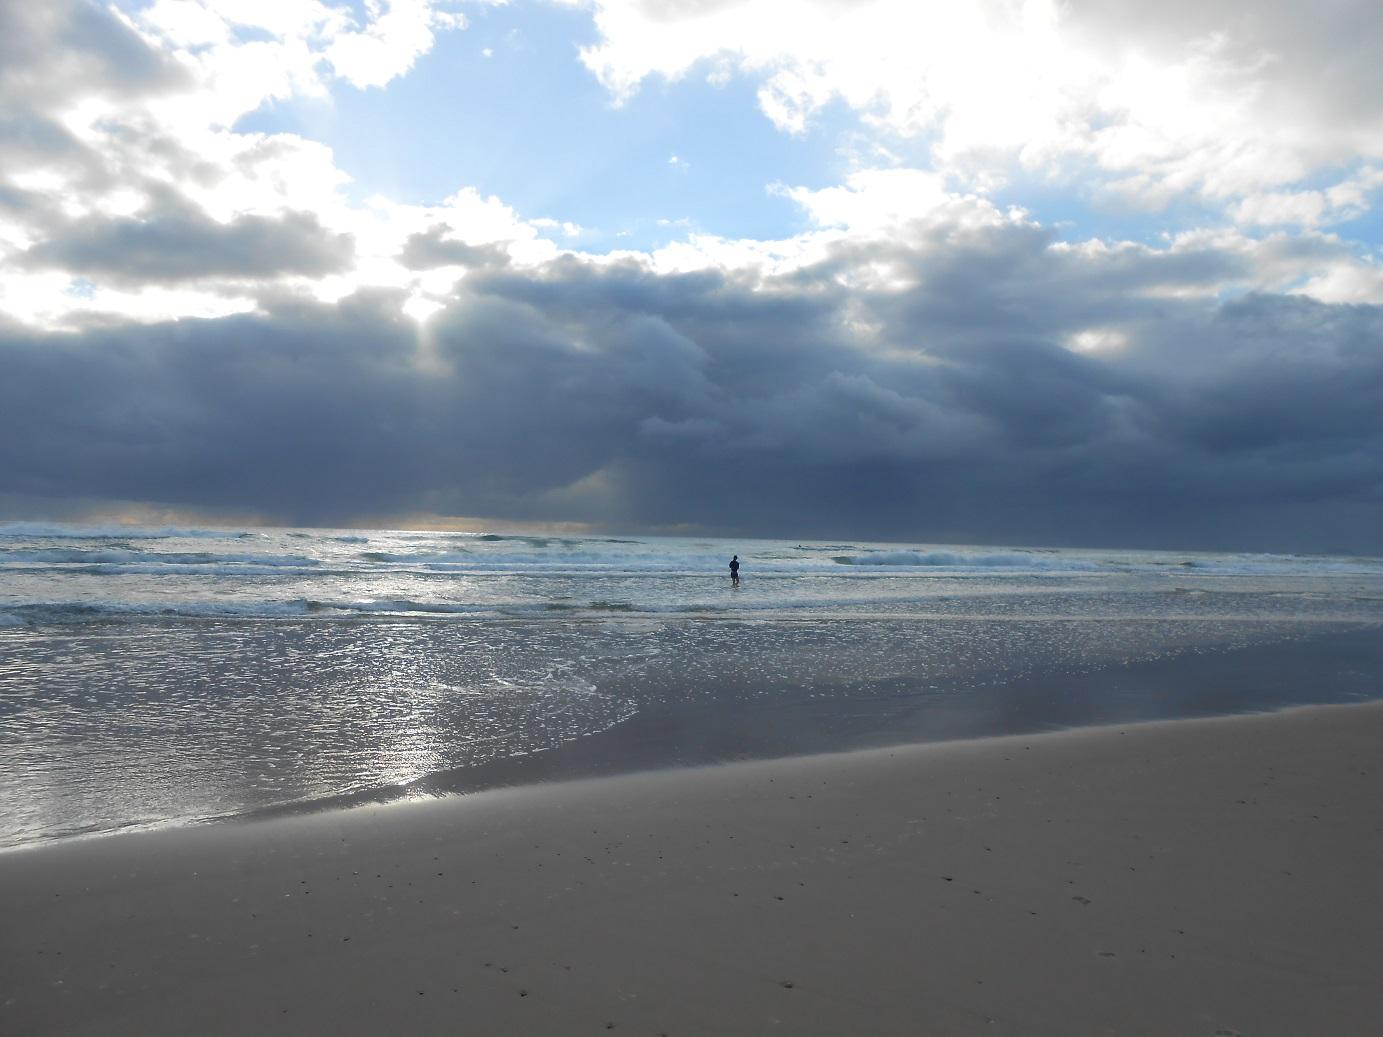 morning beach walk 005 - Copy